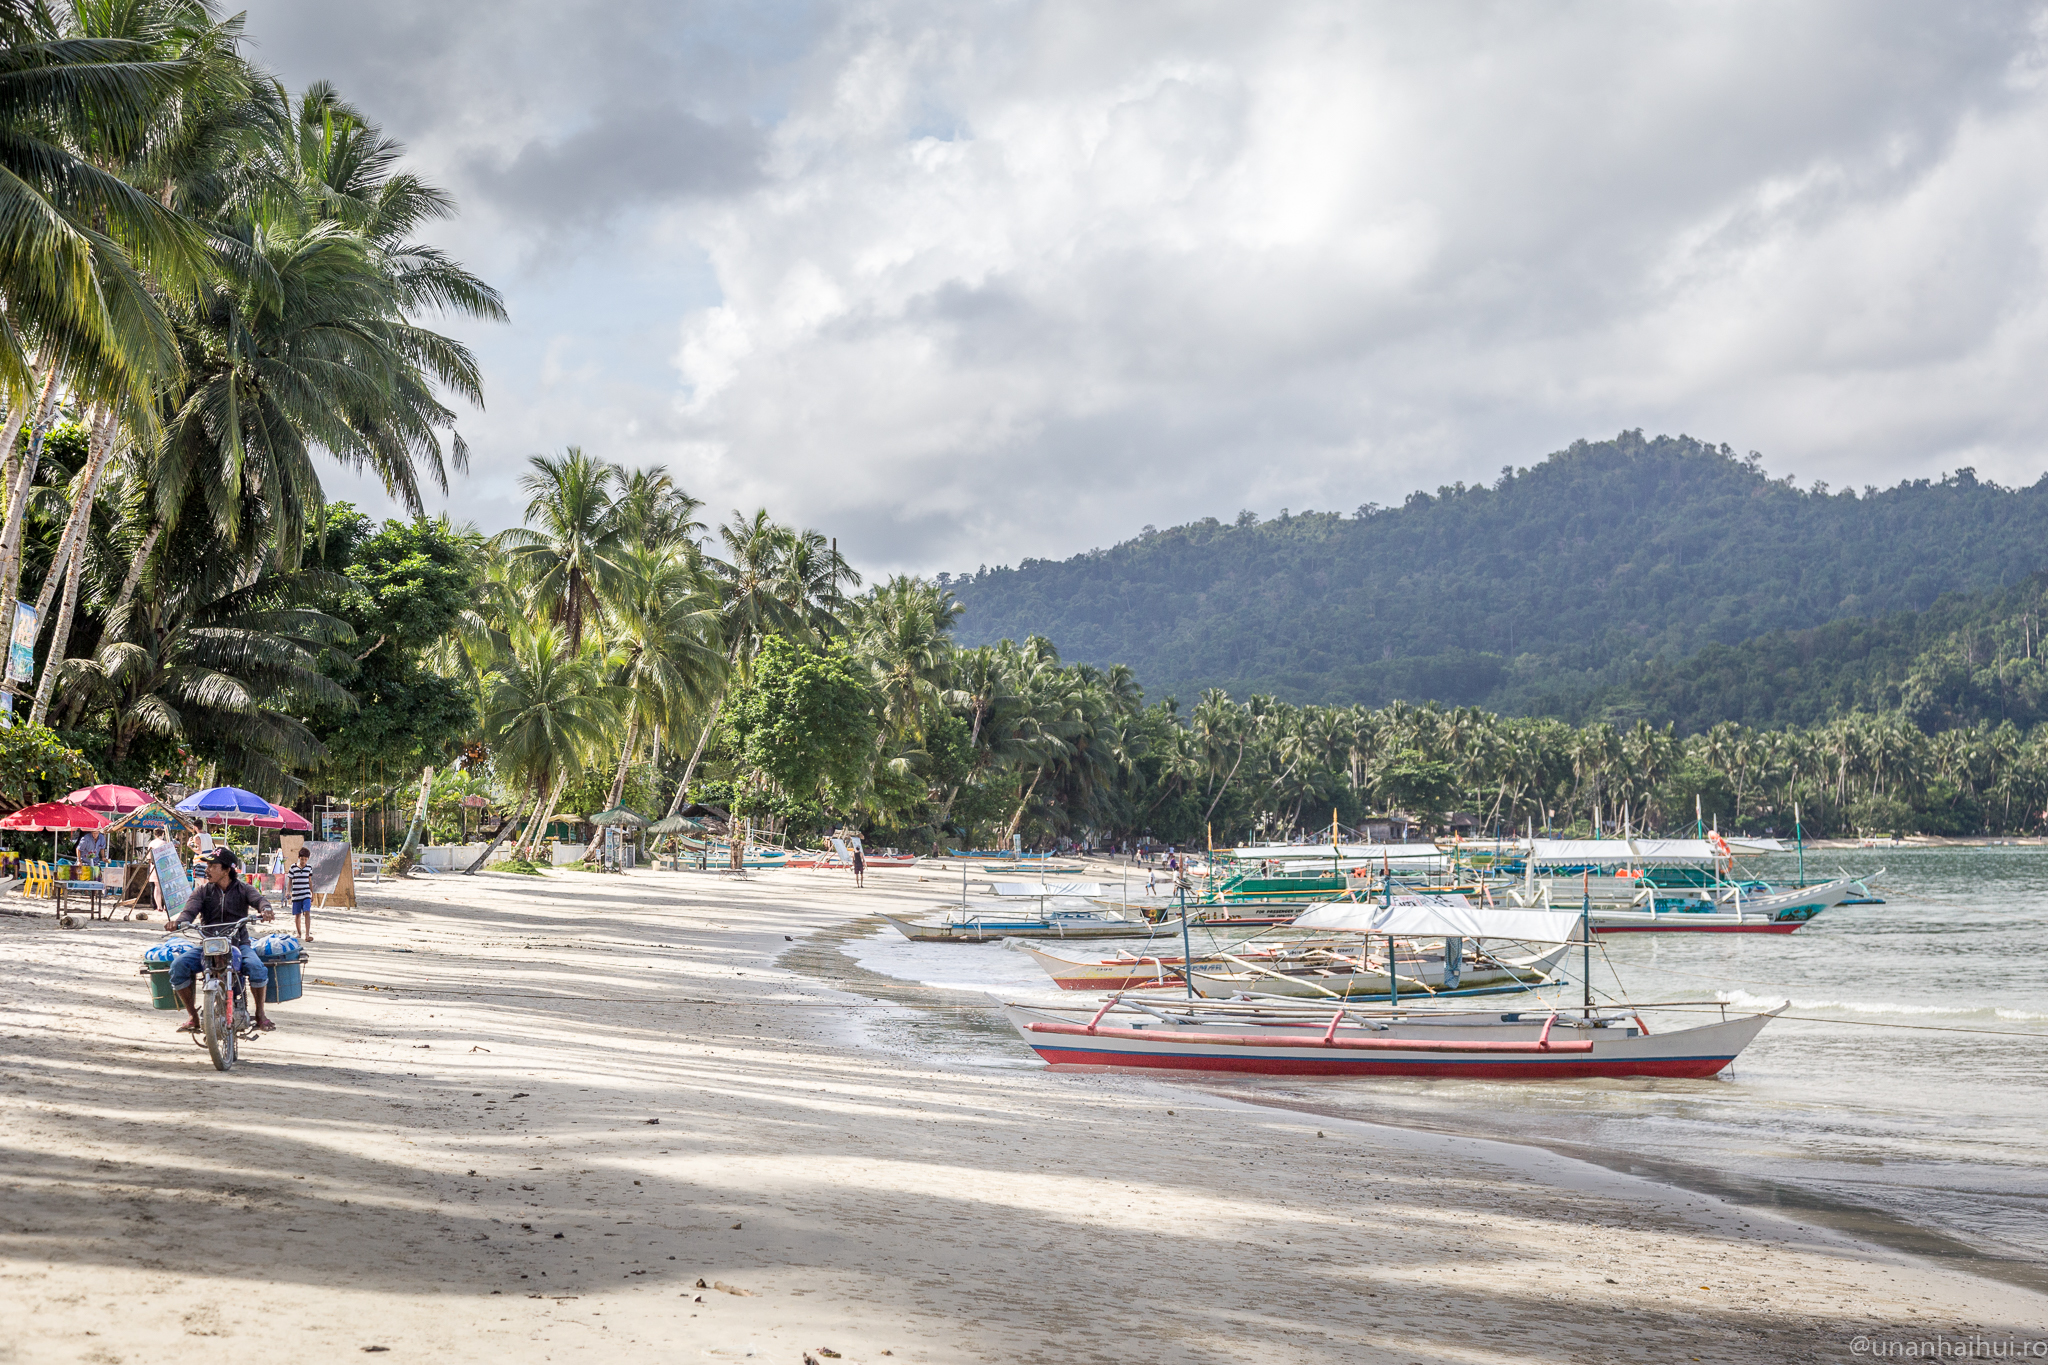 Viațaînșlapi– o ziînPort Barton, Palawan